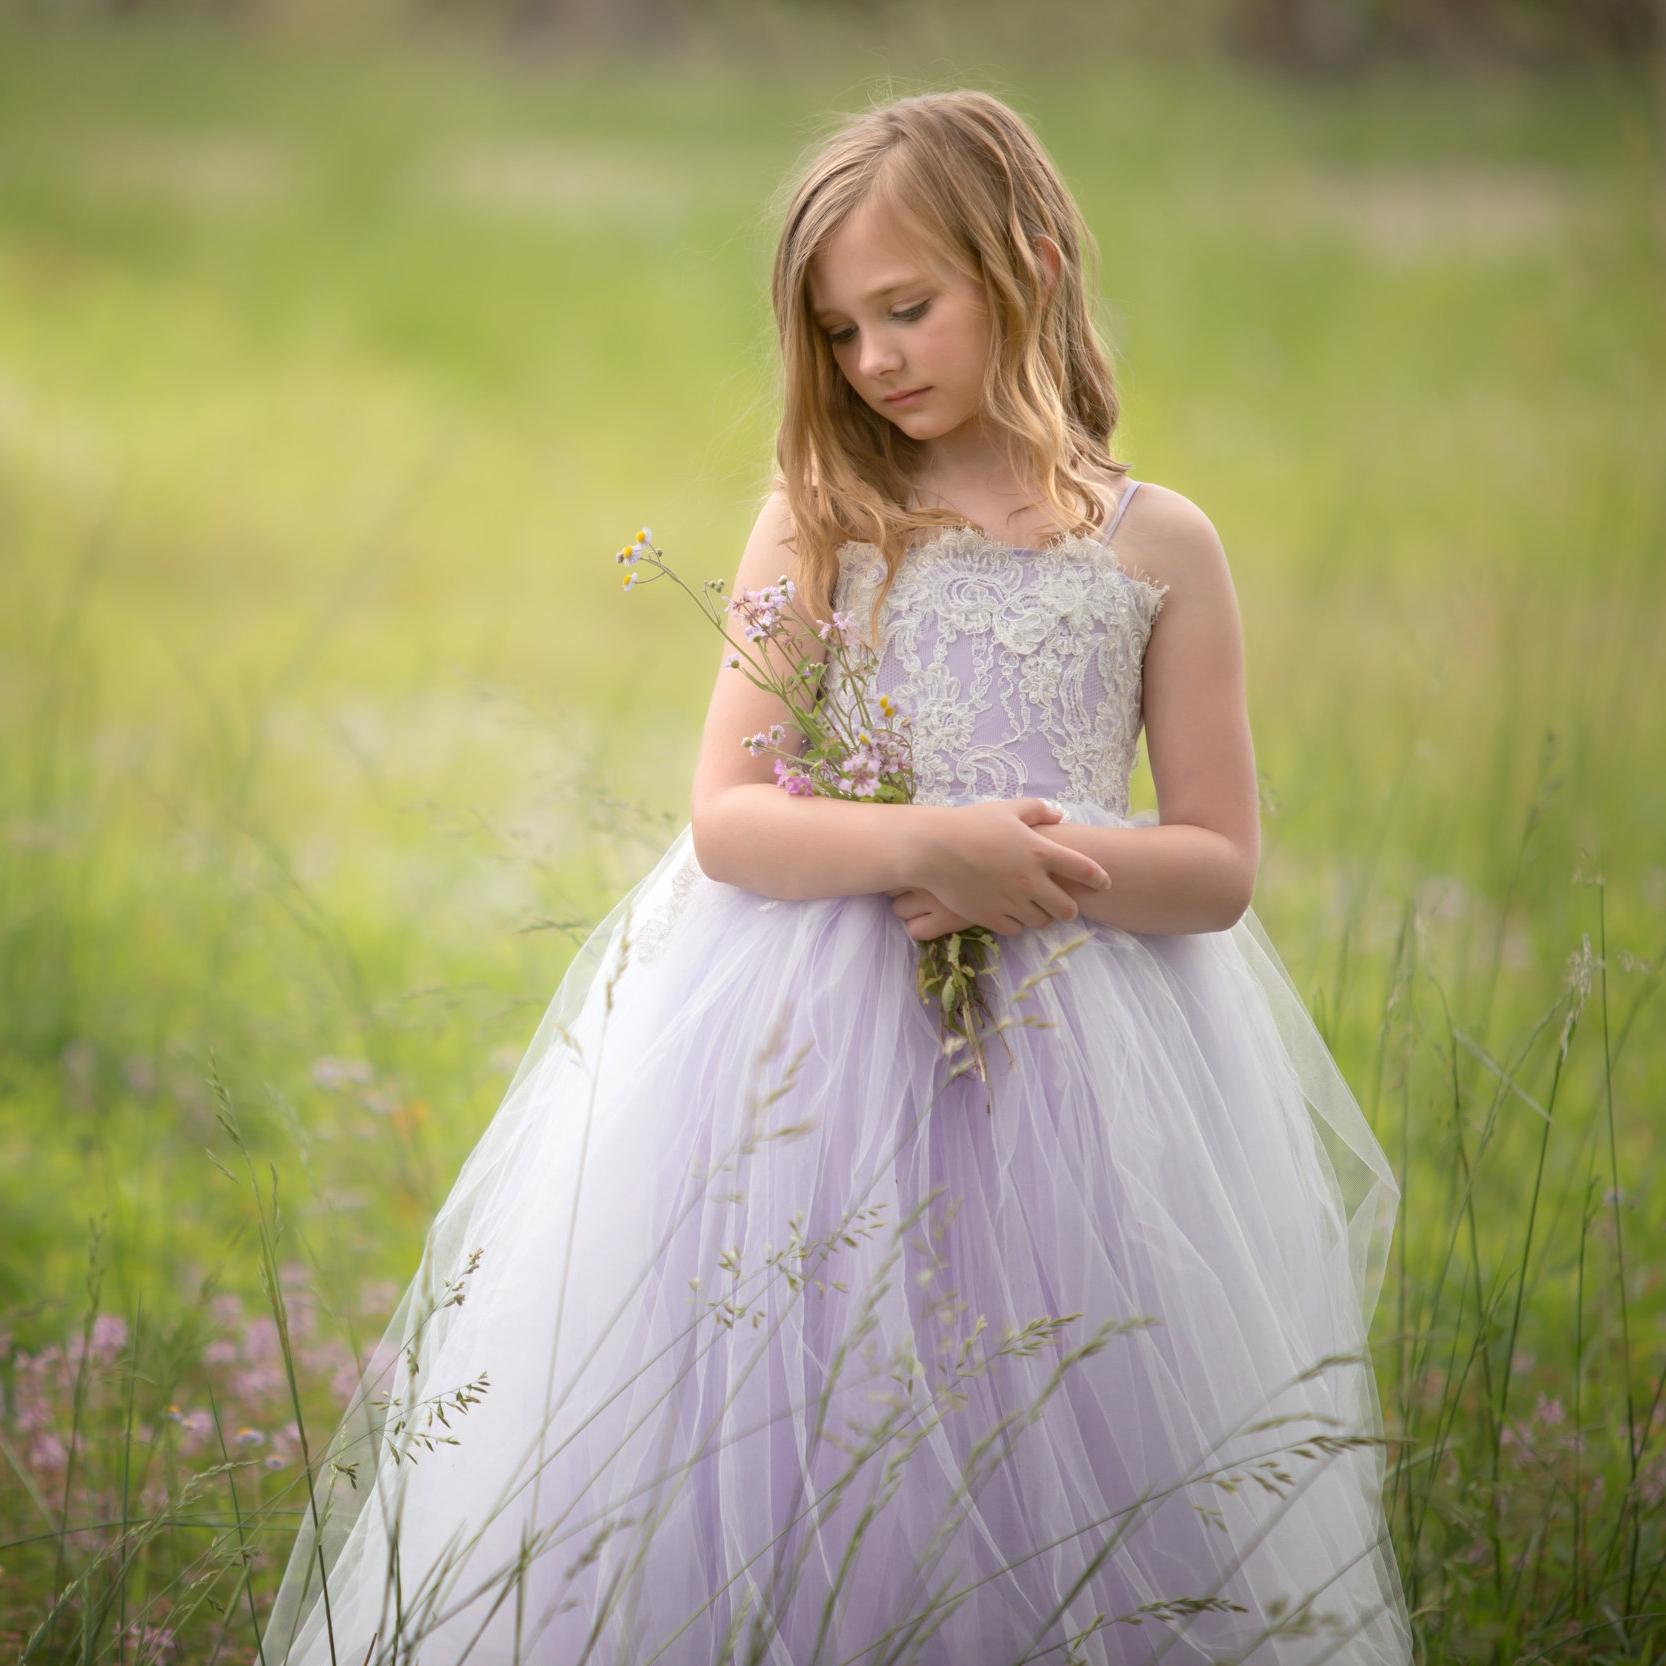 boca-raton-child-photographer-parkland-family-photographer-coral-springs-wellington-lake-worth-boynton-lantana-alissa-delucca-photography-girl-in-purple-couture-gown.jpg